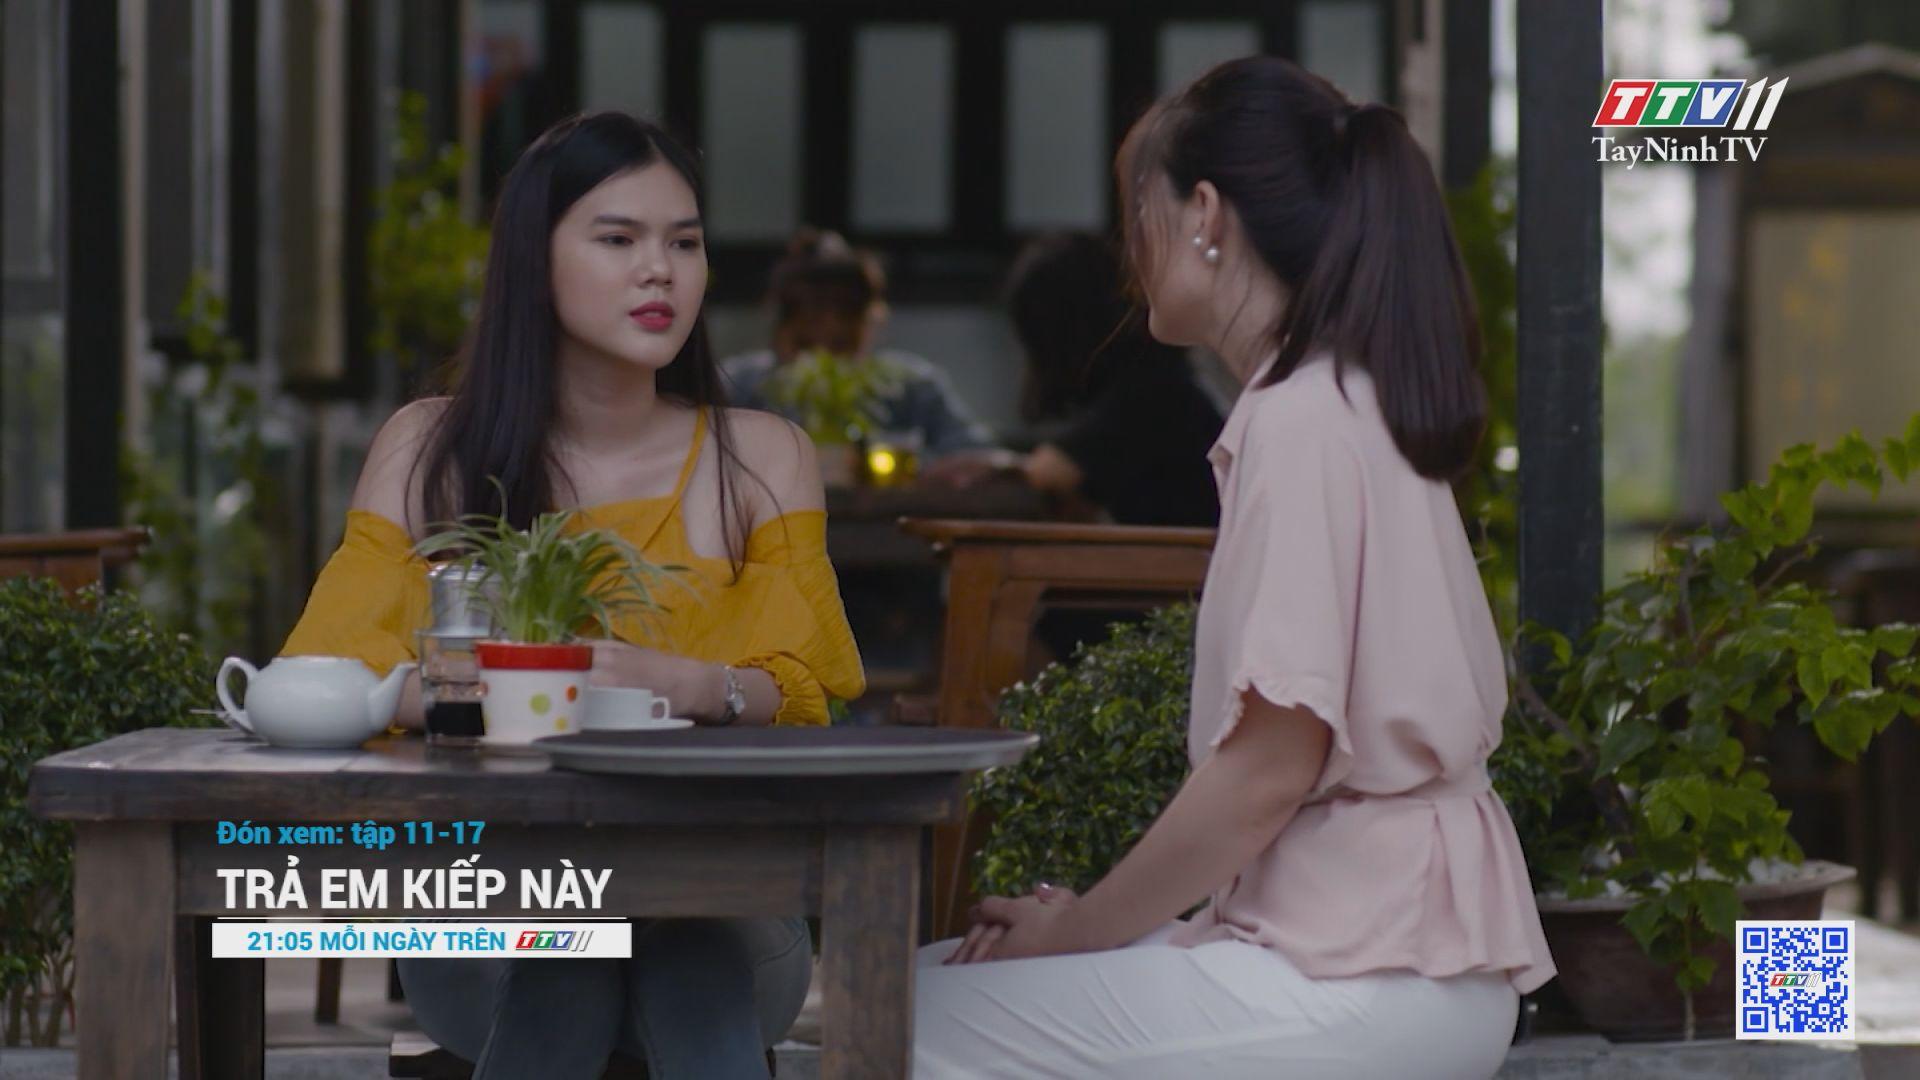 Phim TRẢ EM KIẾP NÀY-Tập 11 đến tập 17 Trailer   TayNinhTV